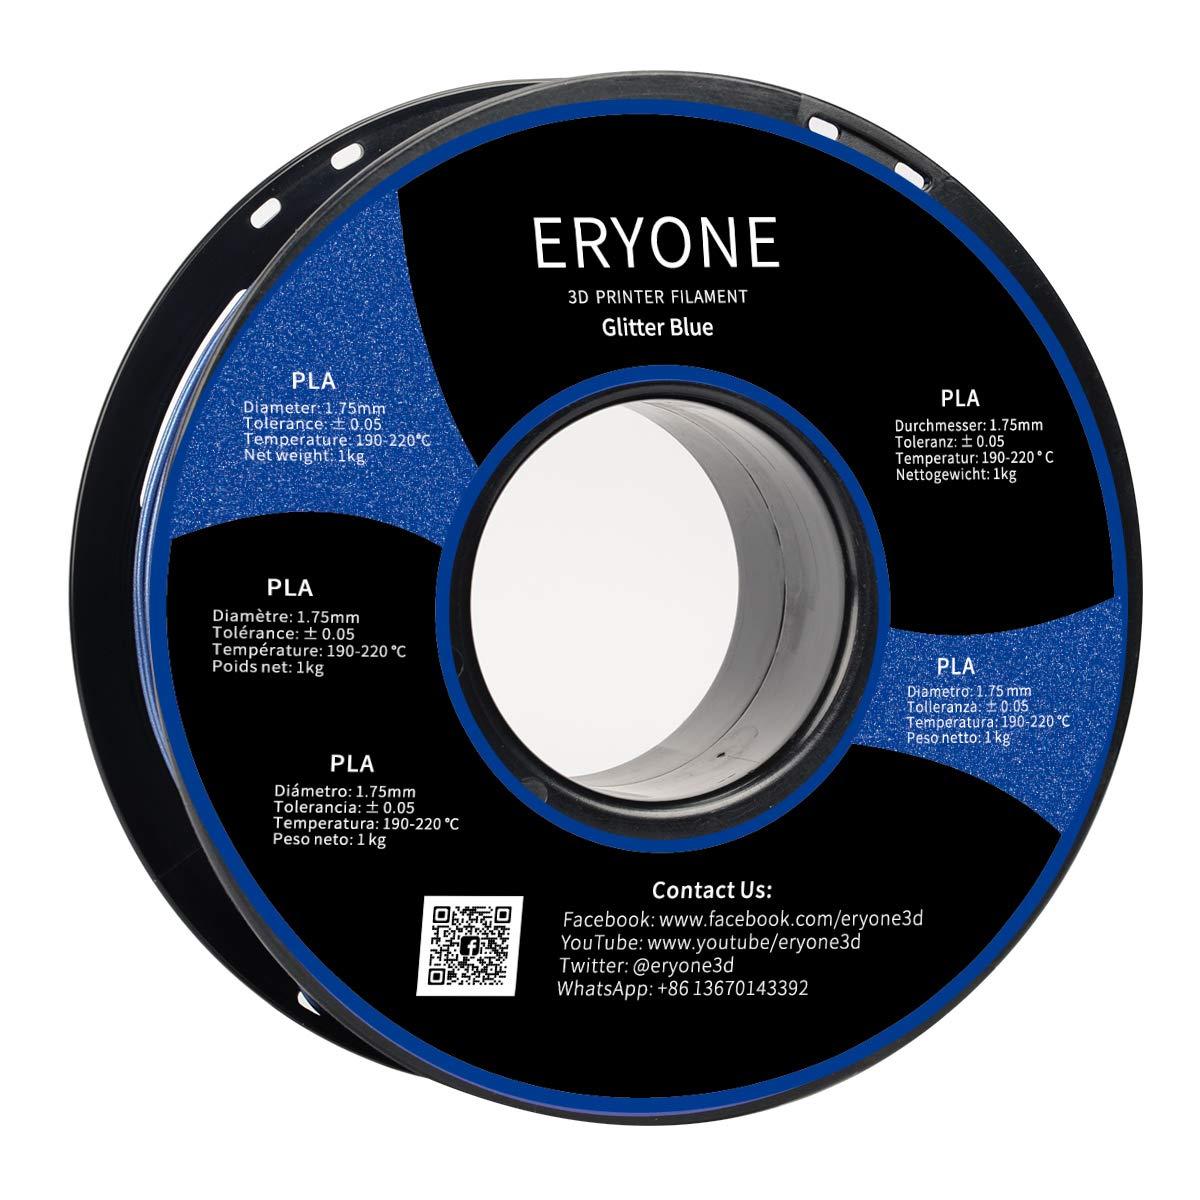 1KG 1 Spool ERYONE PLA Filament For 3D Printer and 3D Pen Filament PLA 1.75mm Sparky Silver Glitter Silver